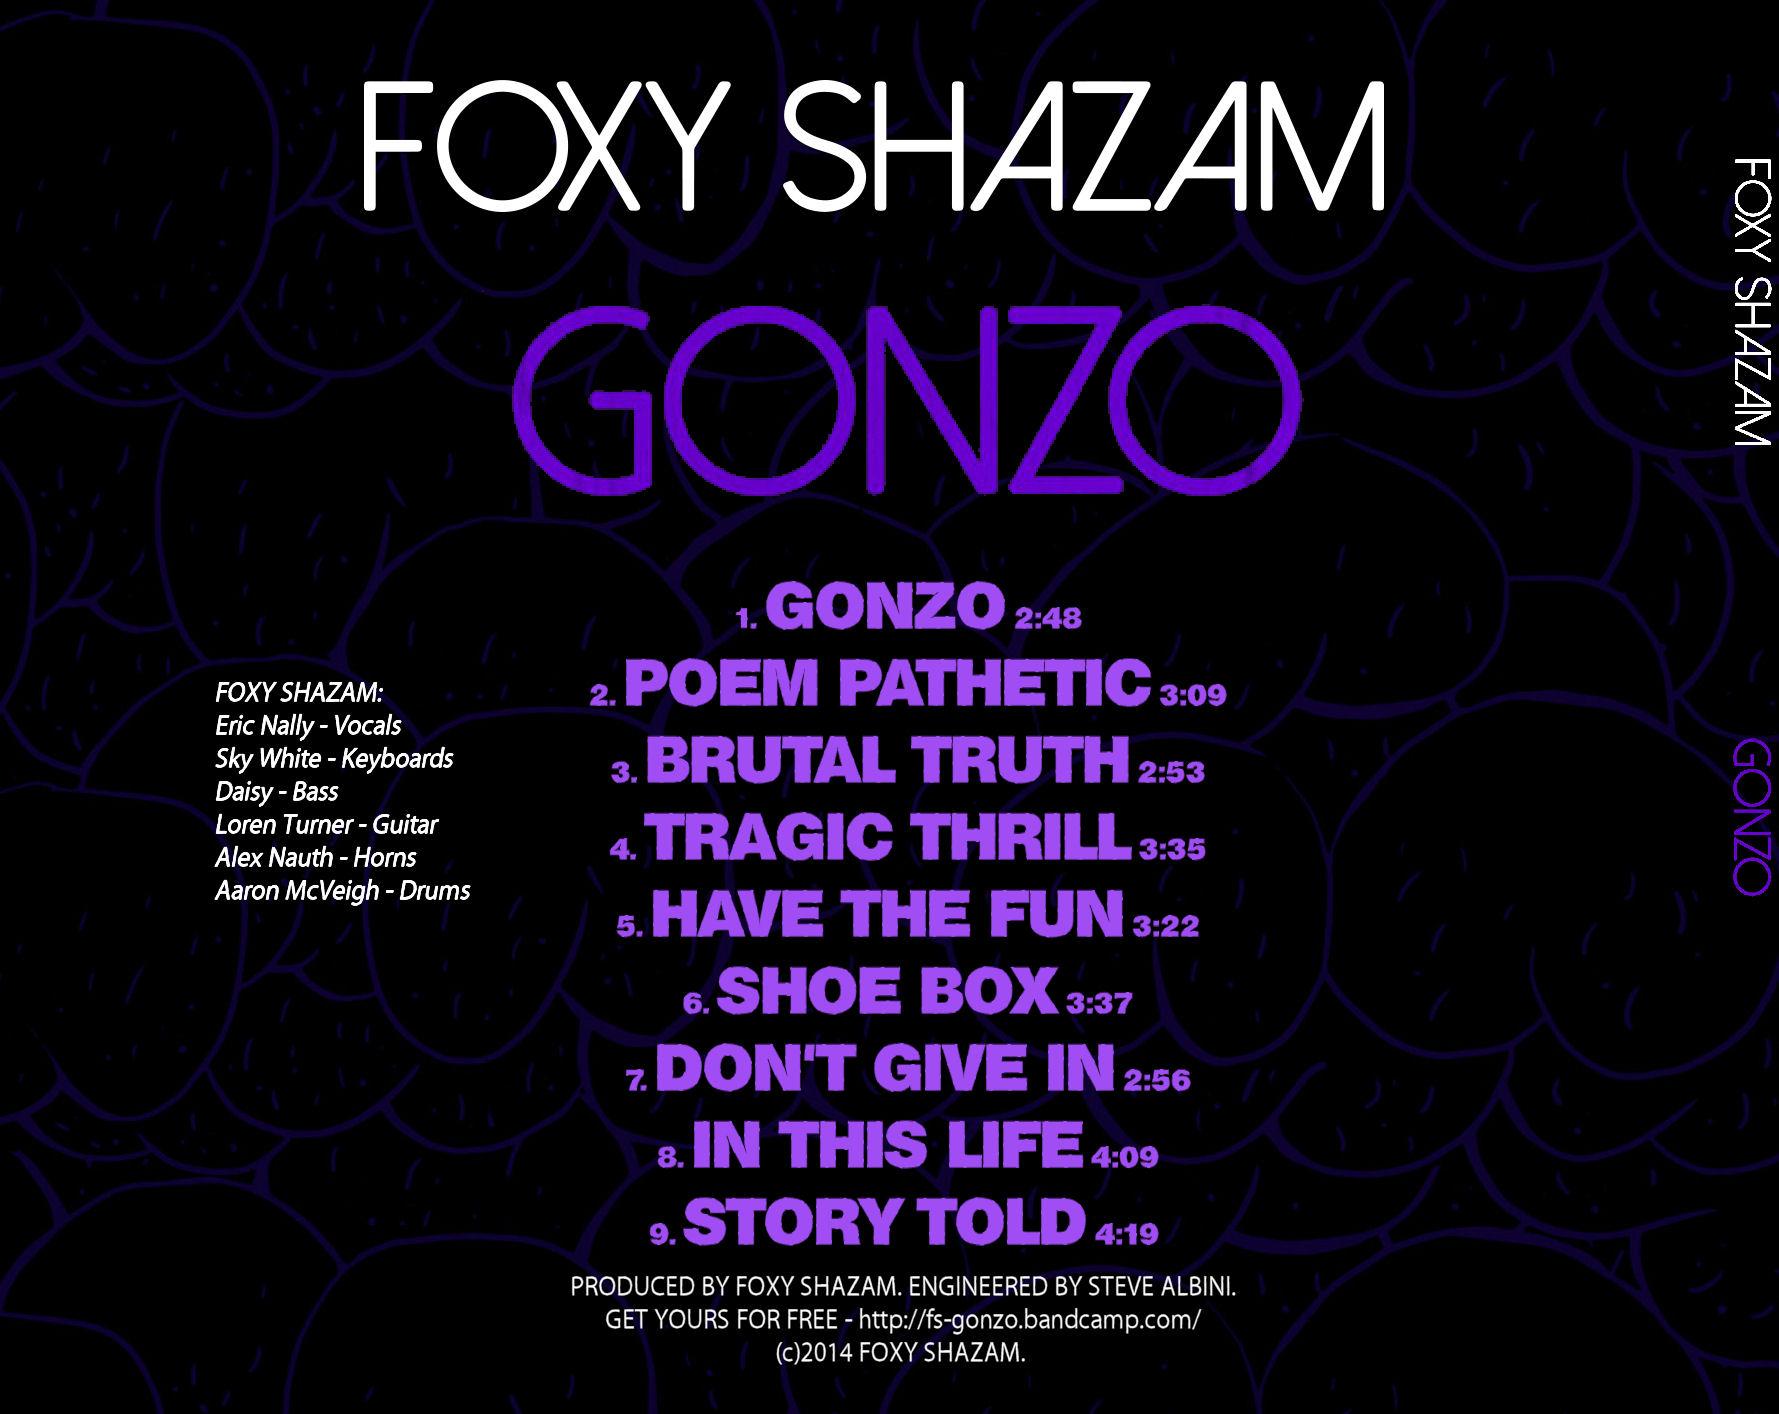 Images for foxy shazam vinyl